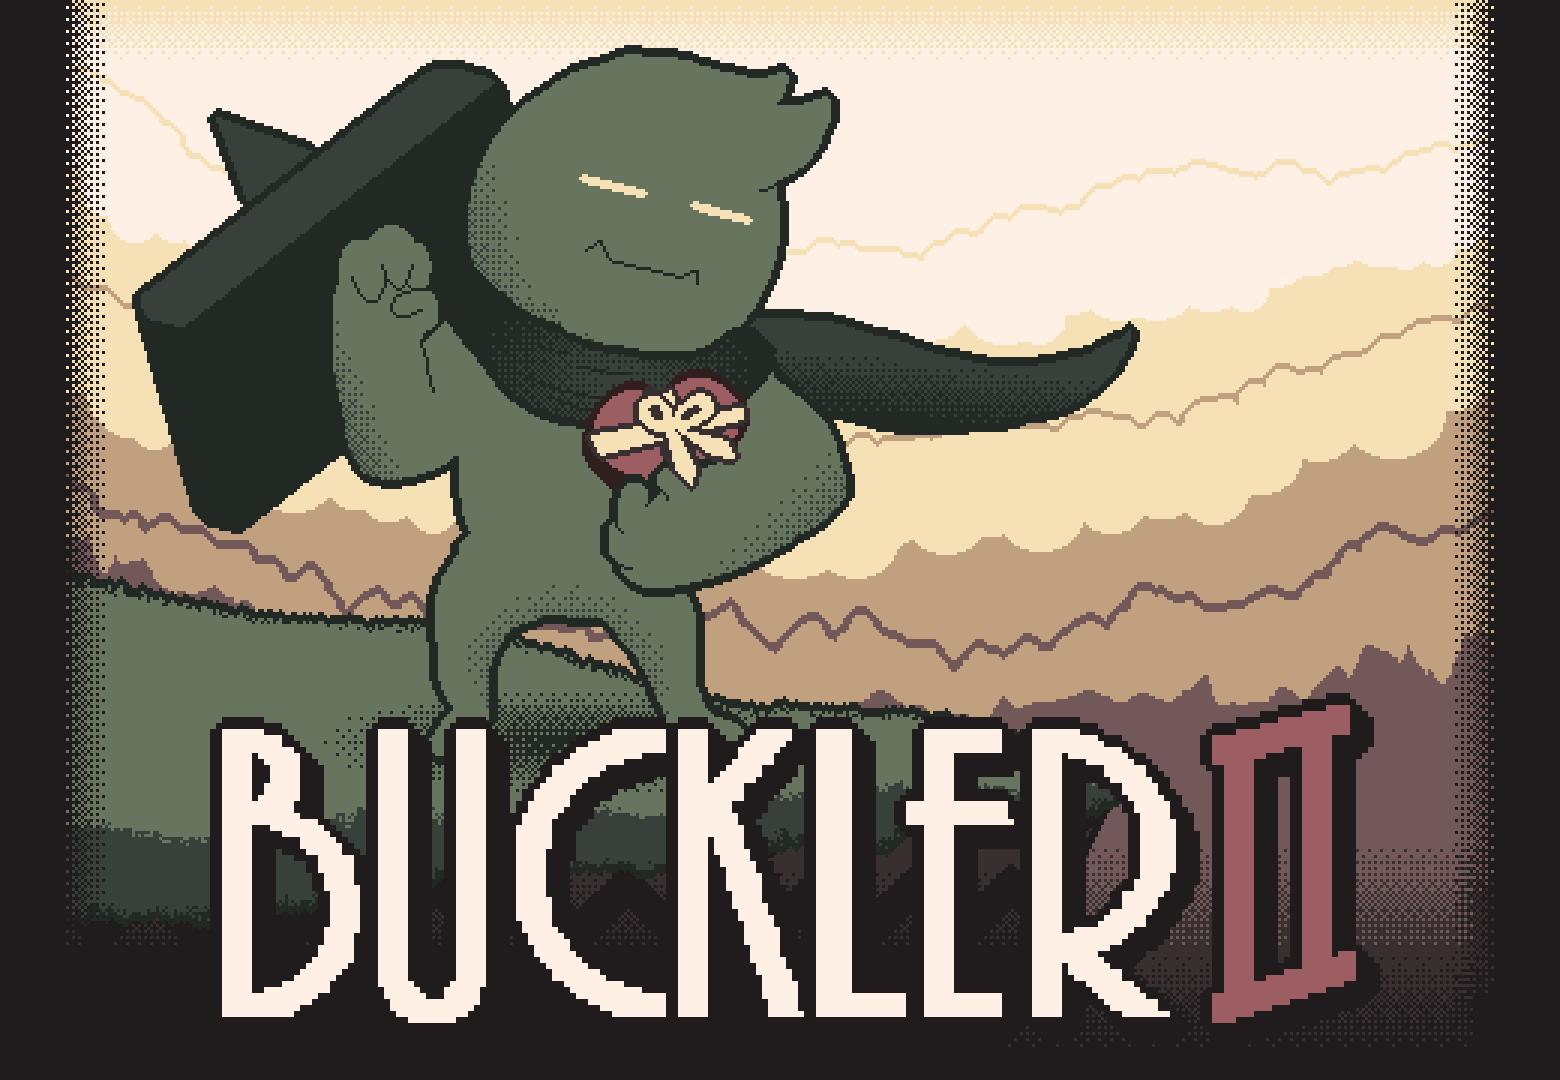 Buckler II (Windows PC) gratis auf itch.io